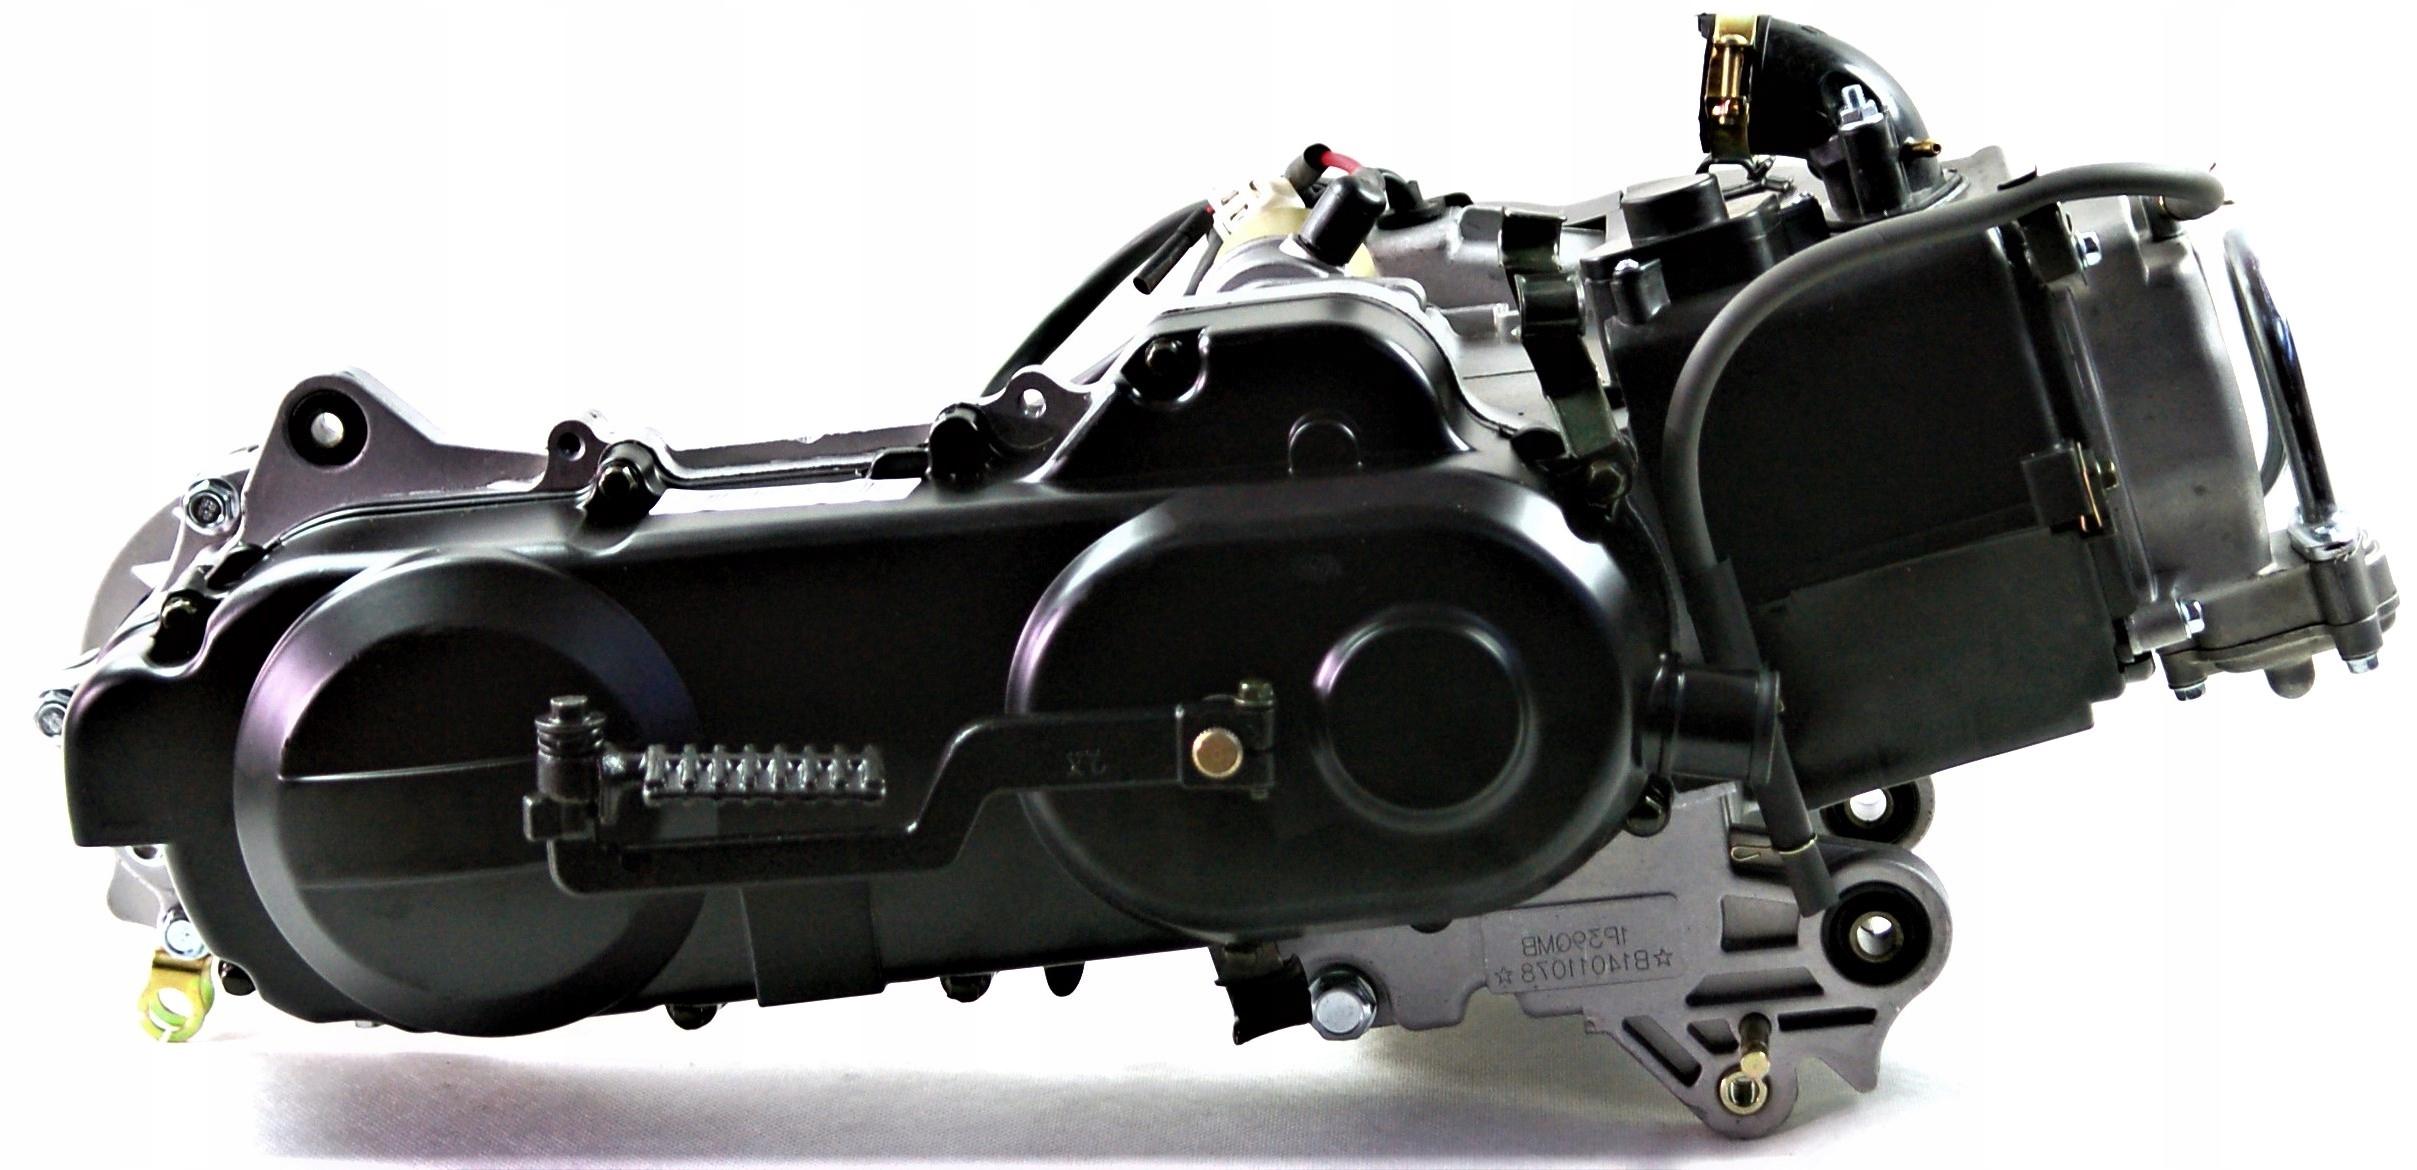 Двигатель к skutera moretti 50cm 4t barton romet, фото 3